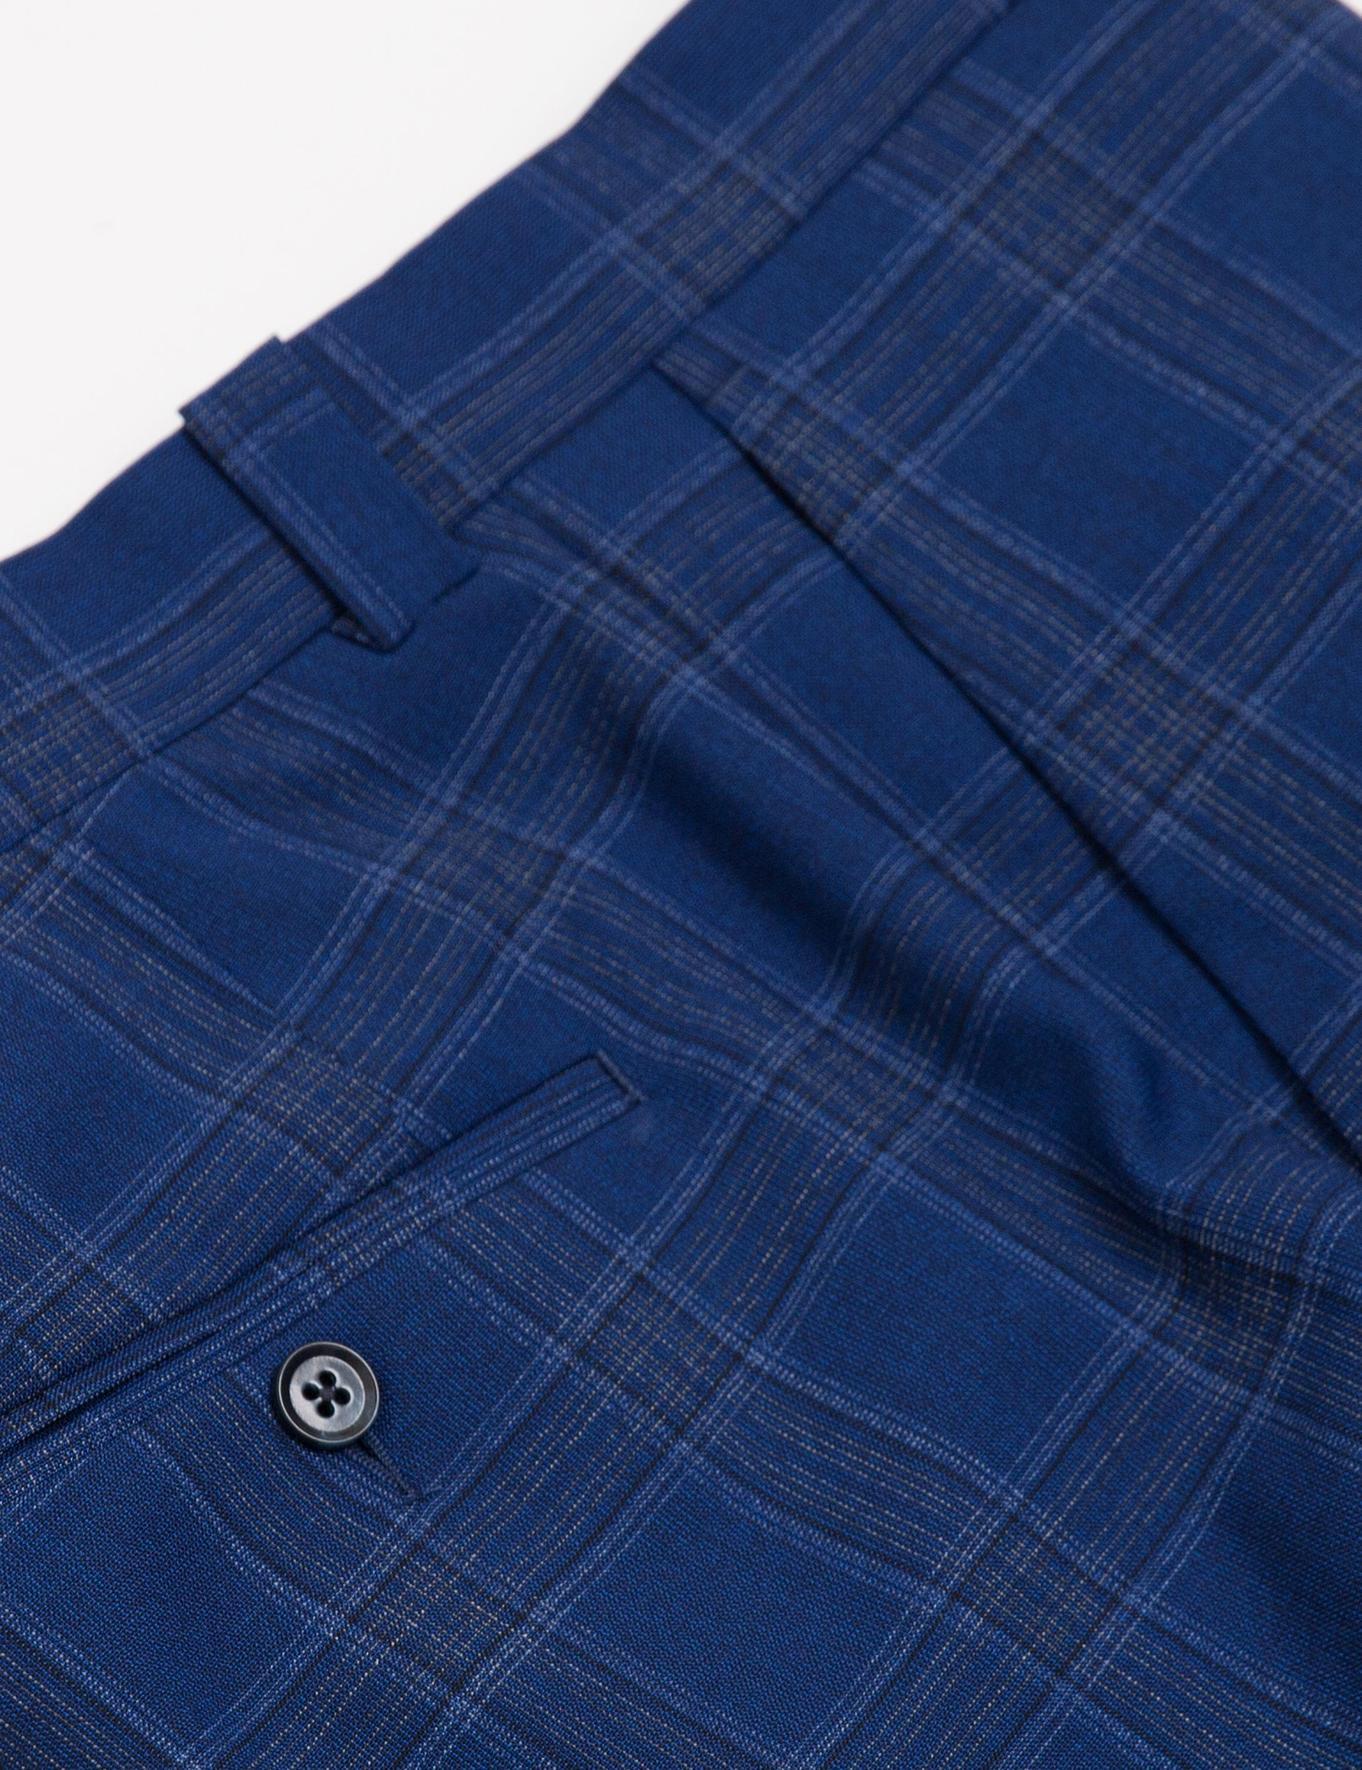 Açık Lacivert Slim Fit Takım Elbise - 50188558011